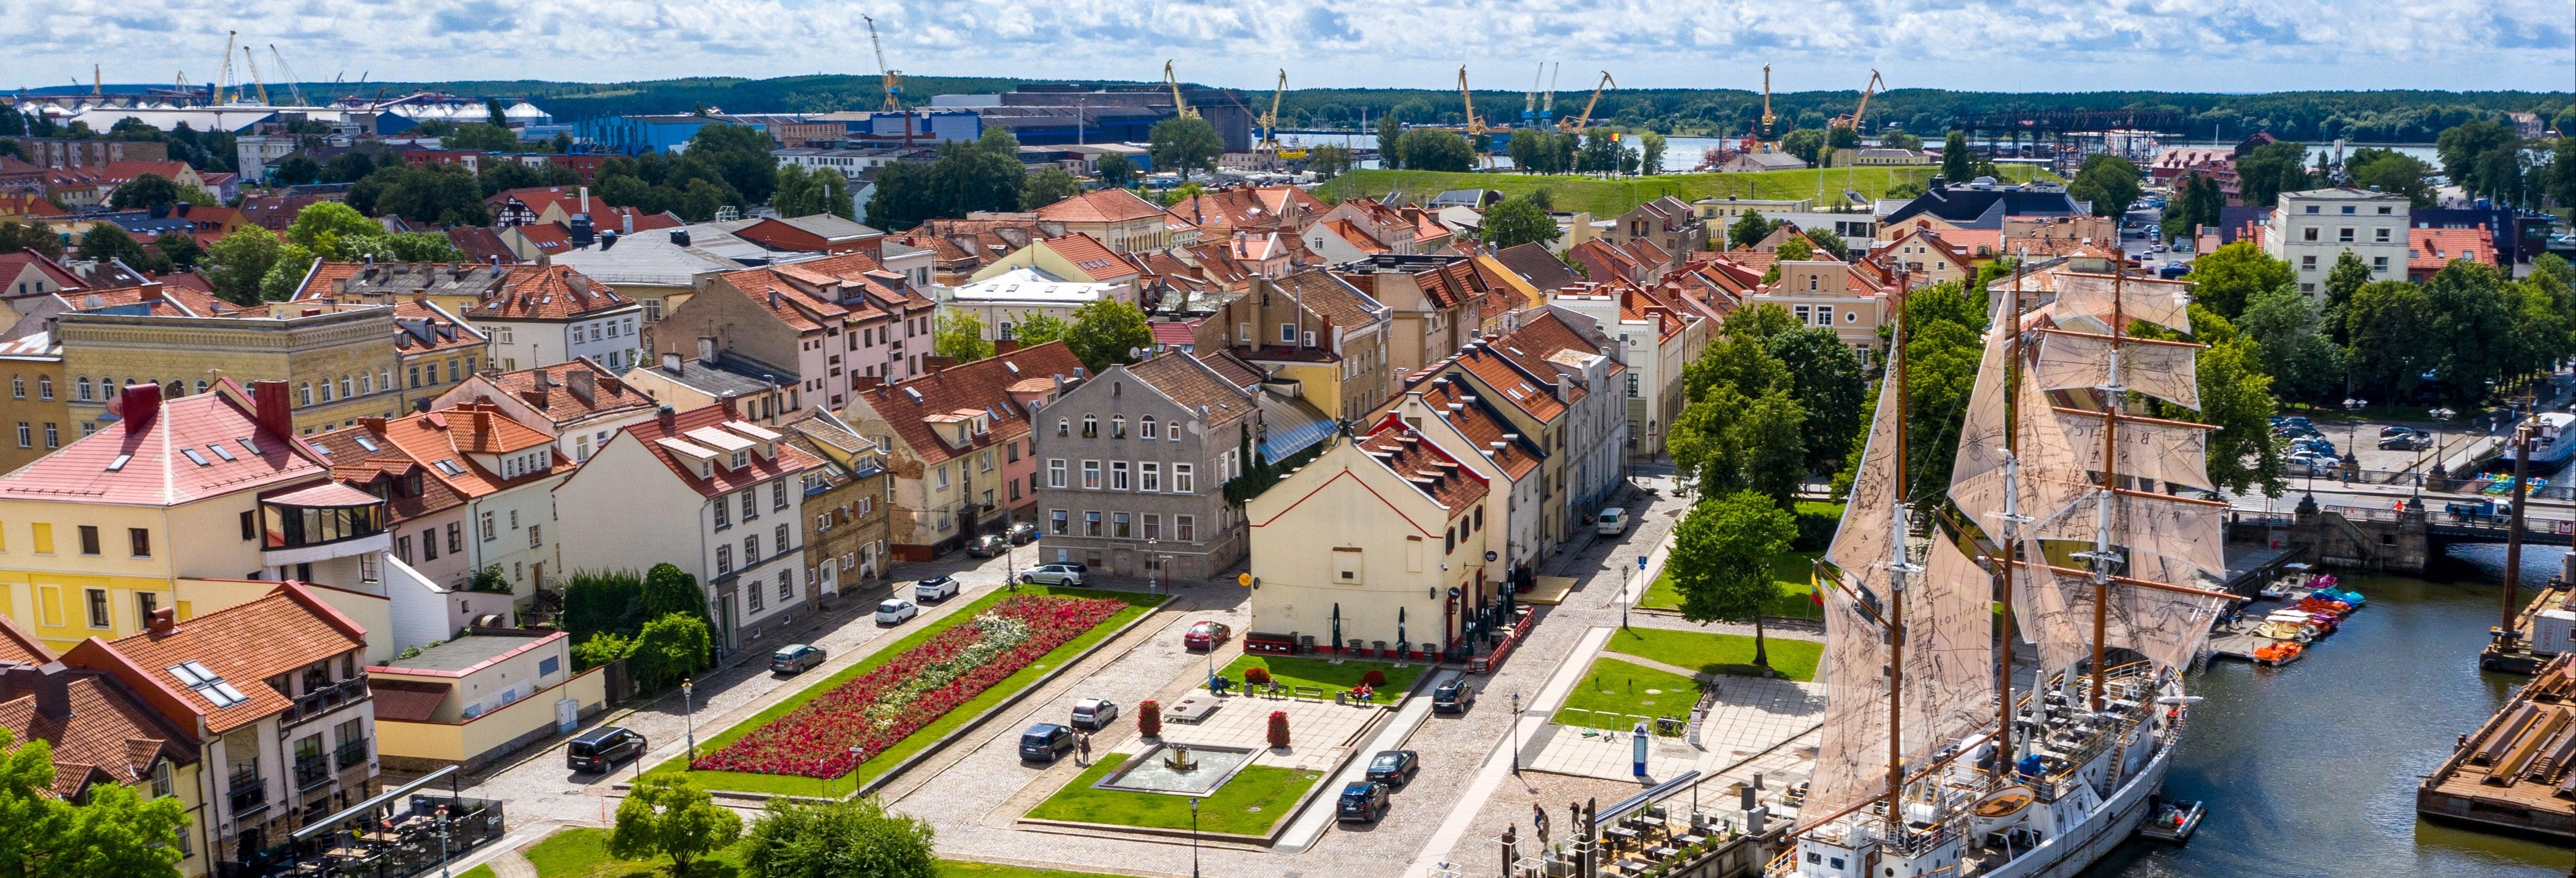 Visite privée de Klaipėda avec guide francophone